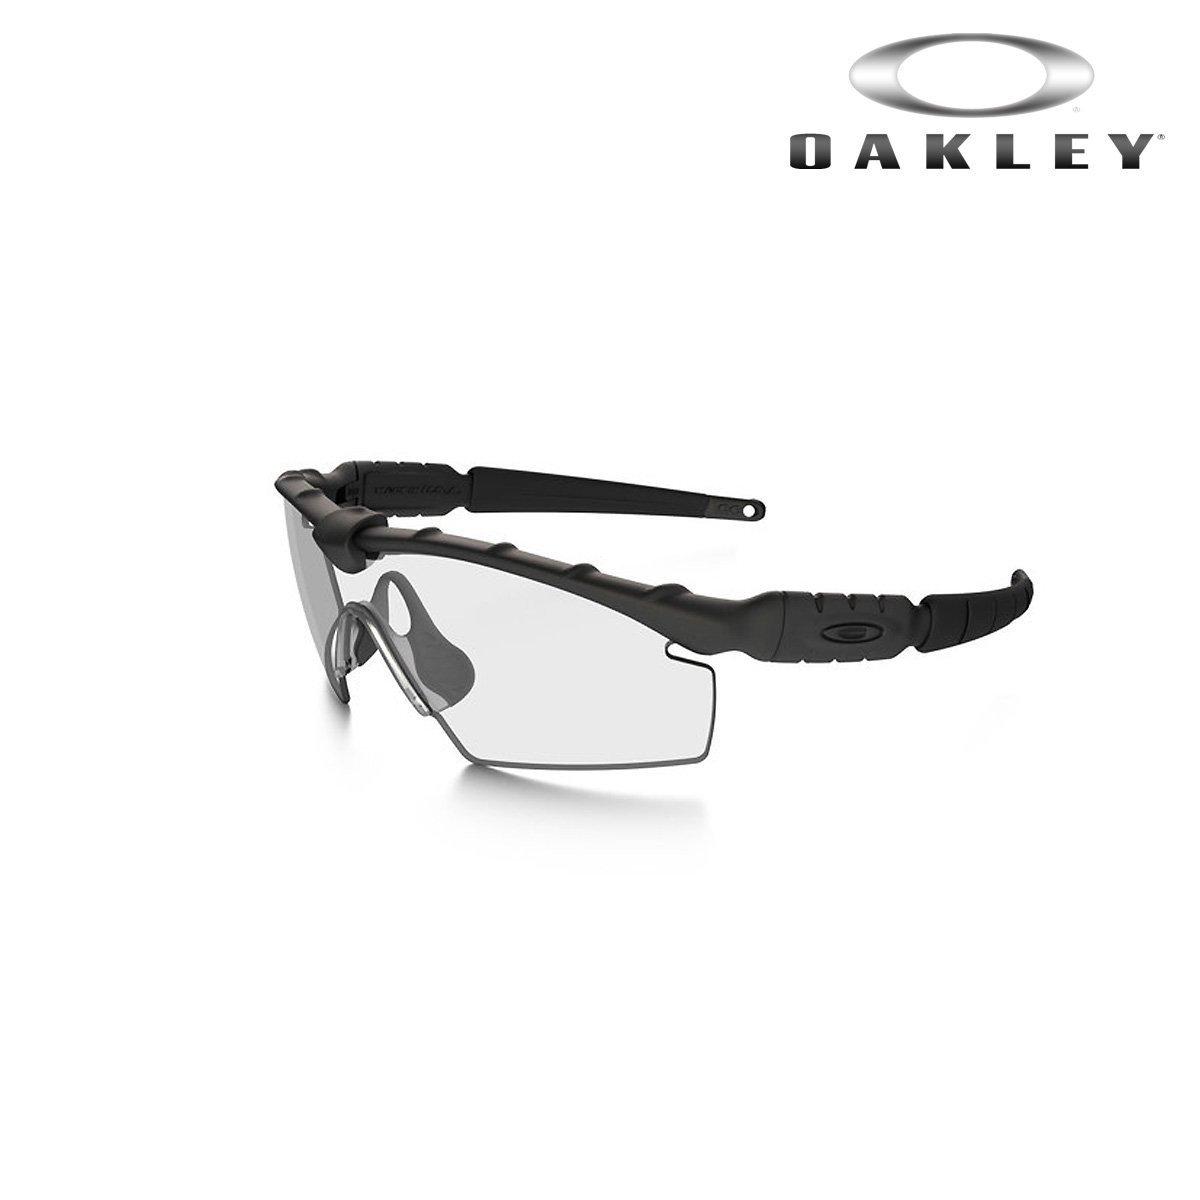 Oakley Ballistic